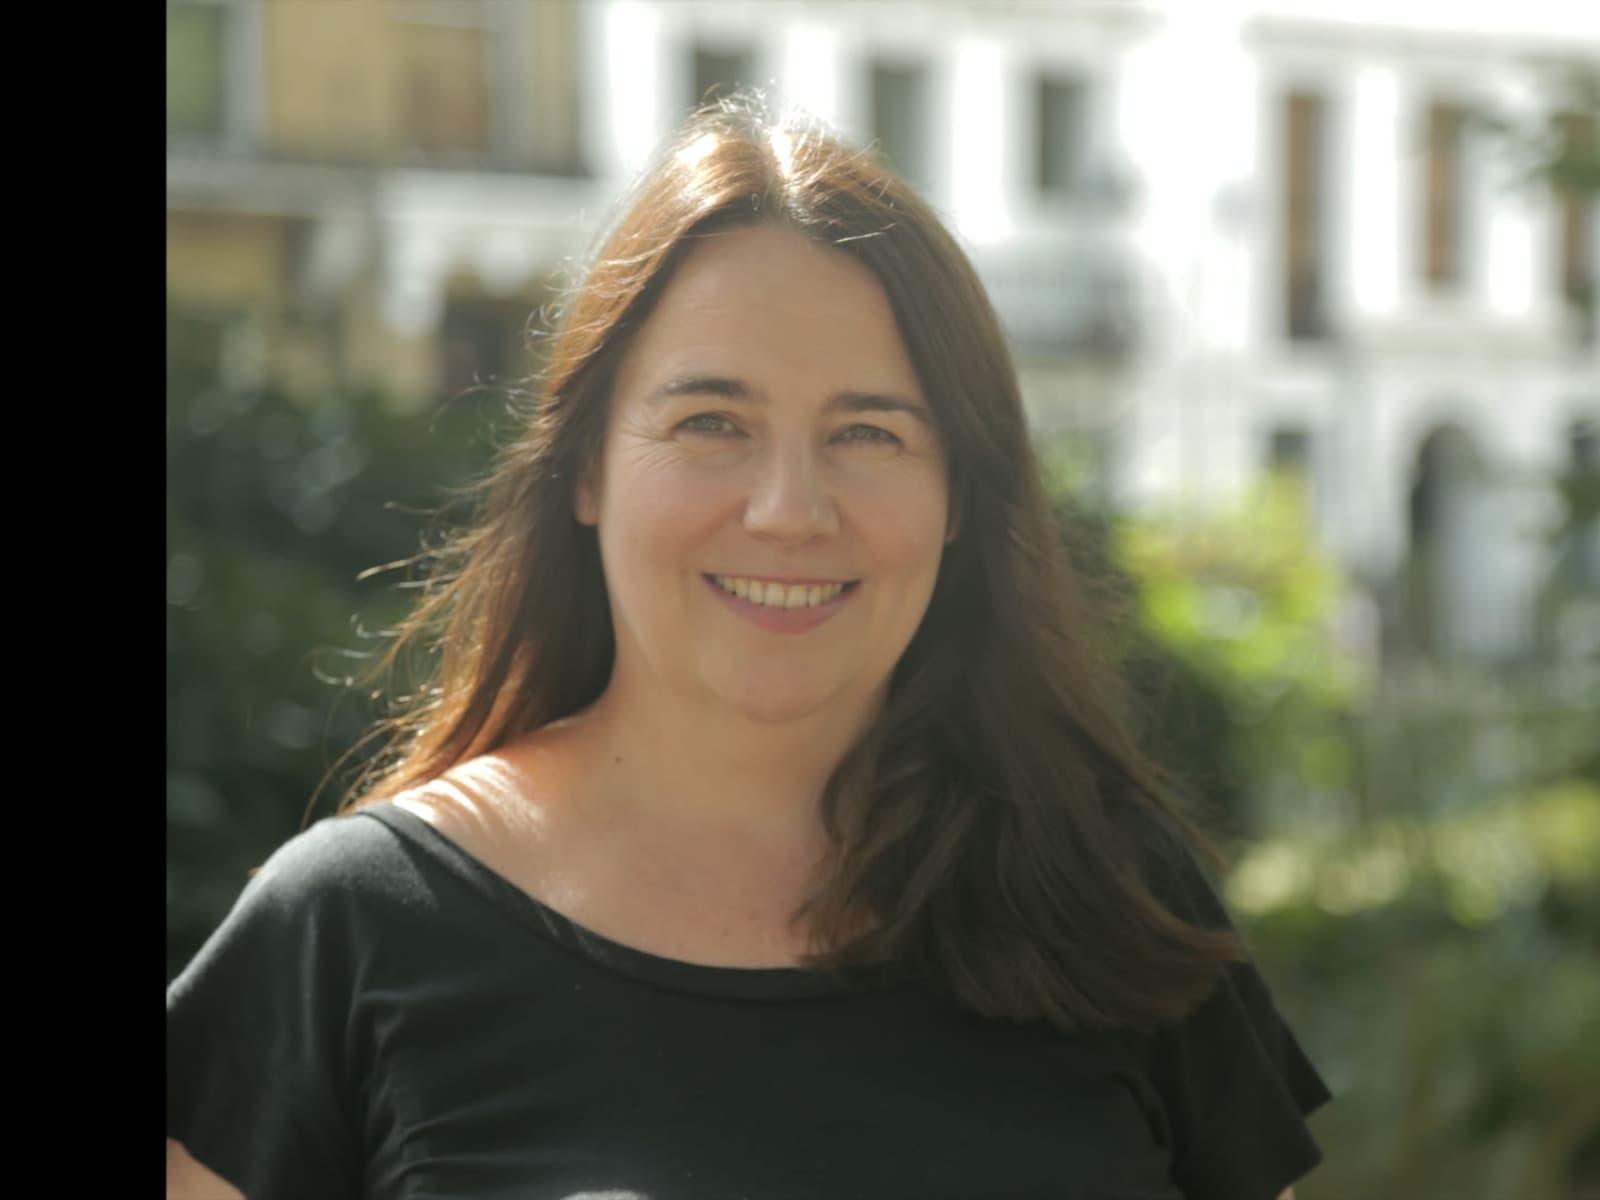 Paula from London, United Kingdom